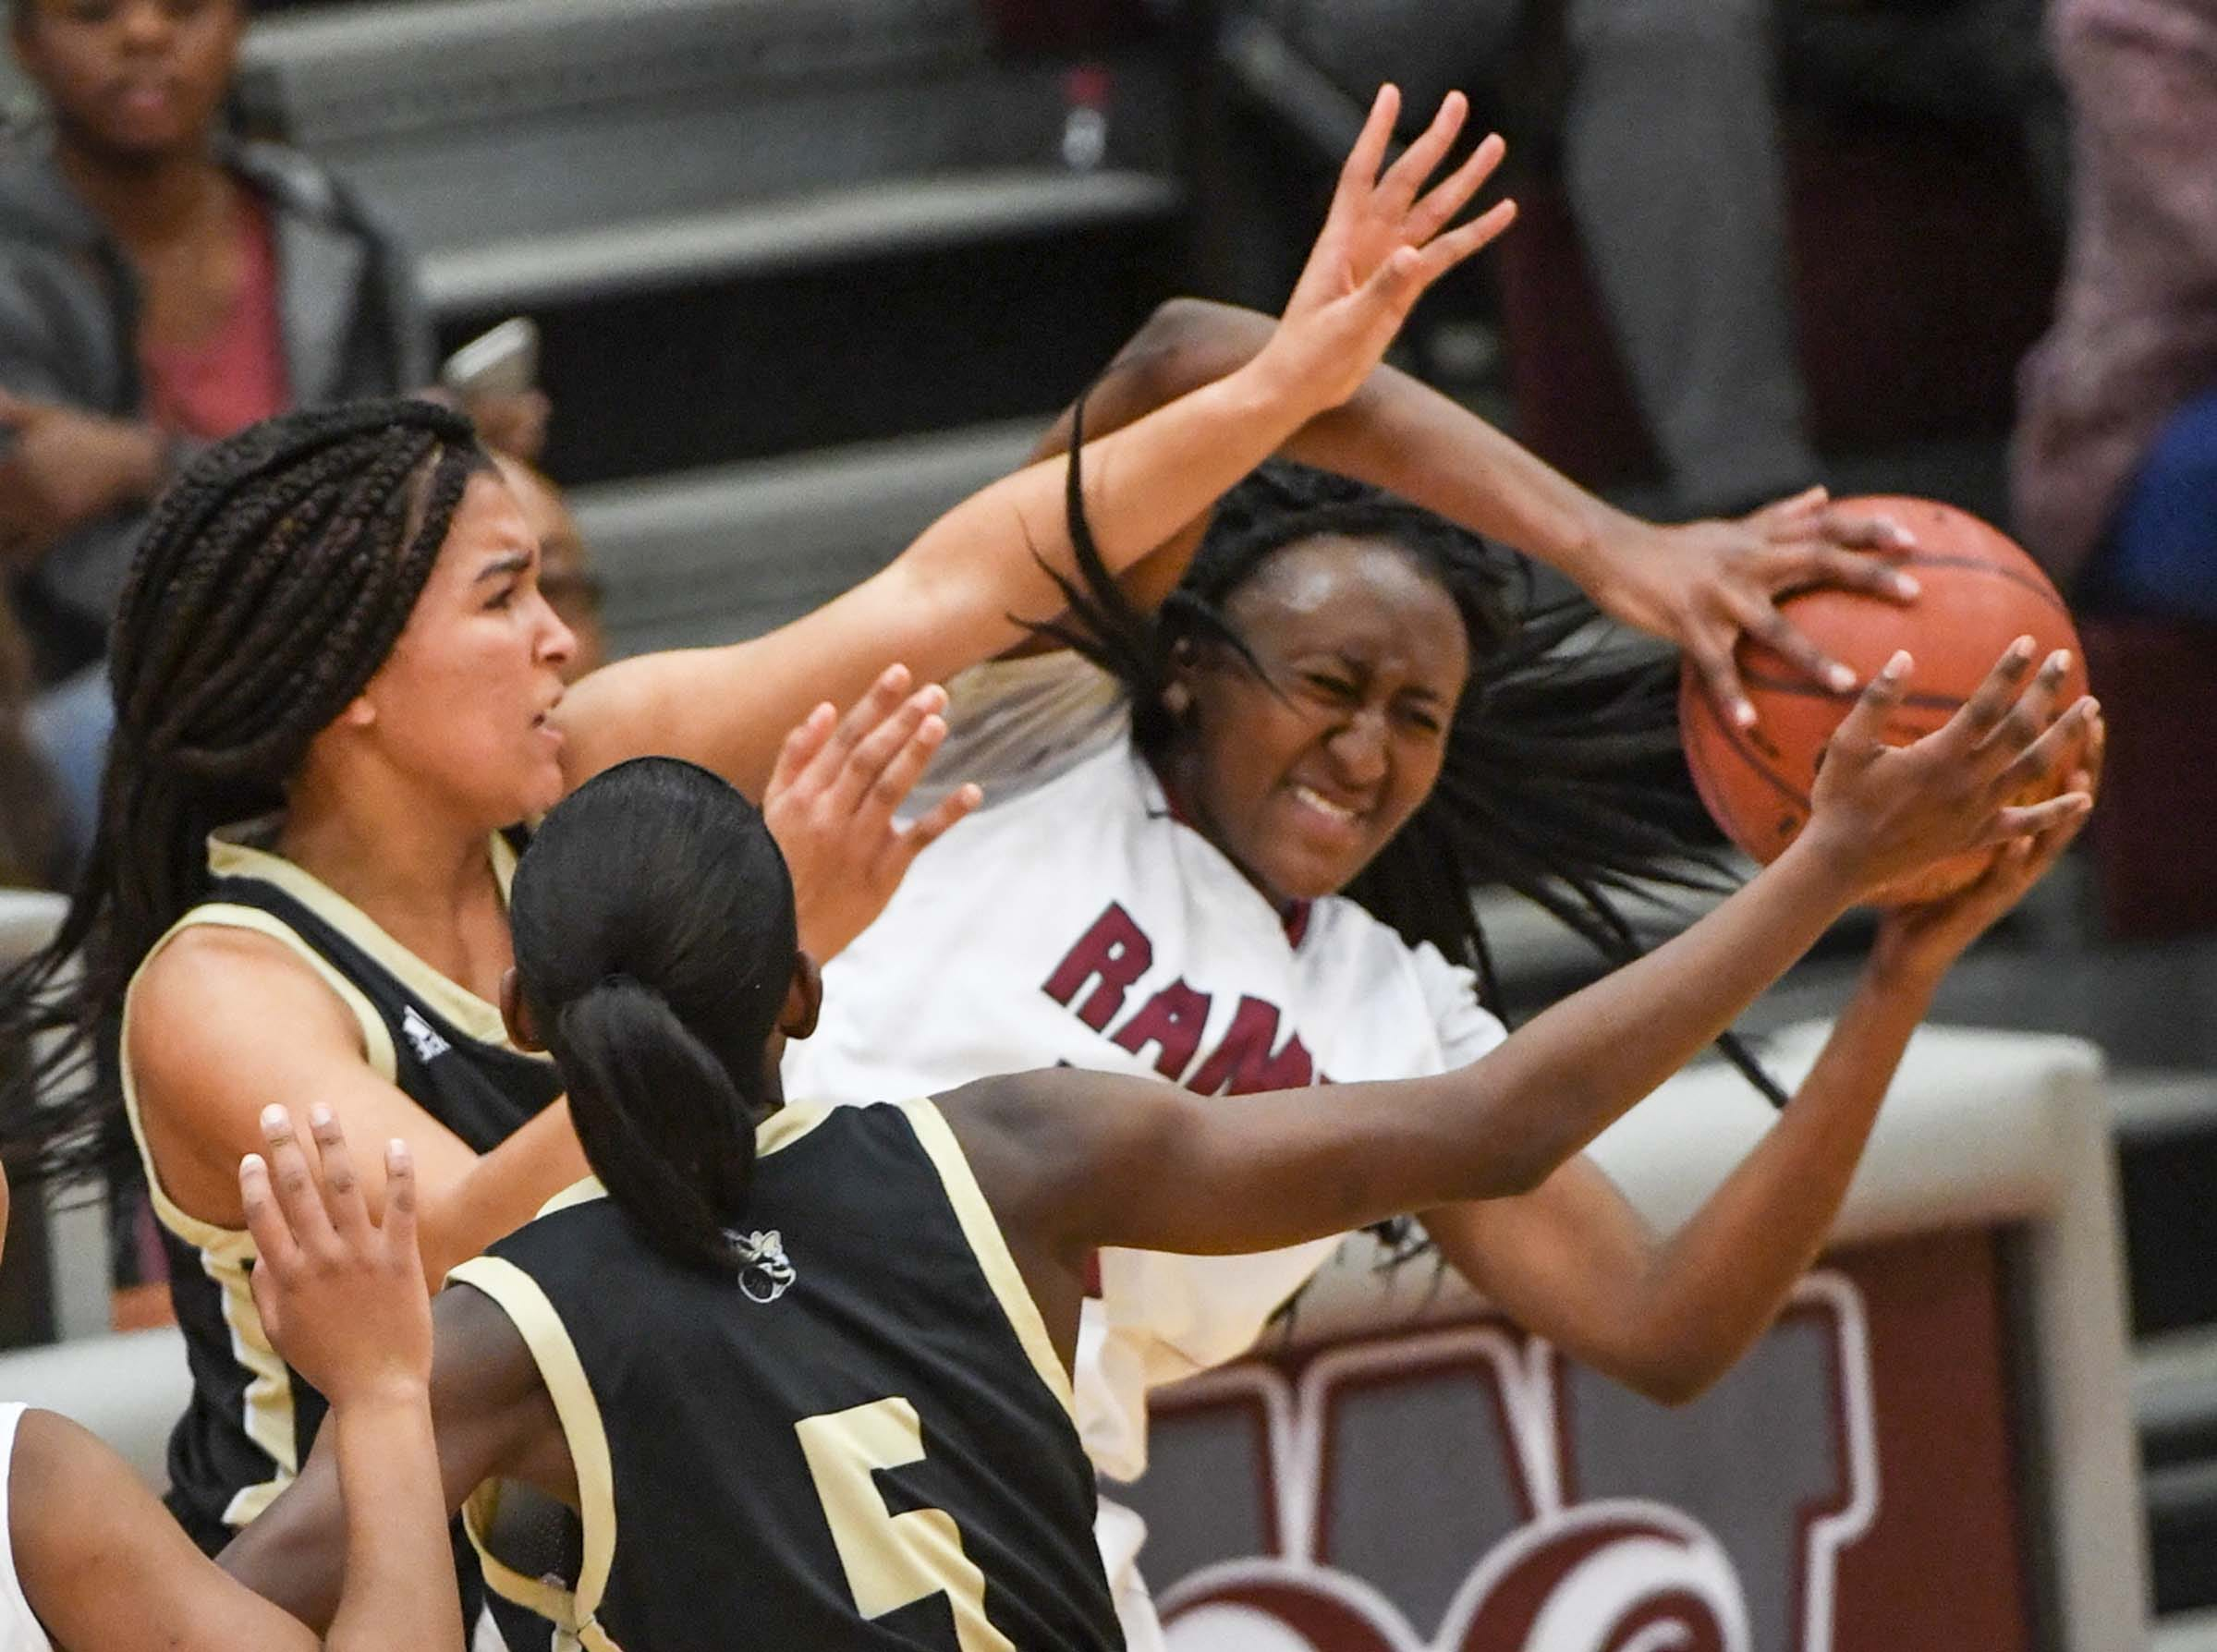 Westside junior Keyshuna Fair(25) rebounds near TL Hanna junior Maleia Bracone(24) during the fourth quarter at Westside High School in Anderson on Friday. Westside won 54-46.